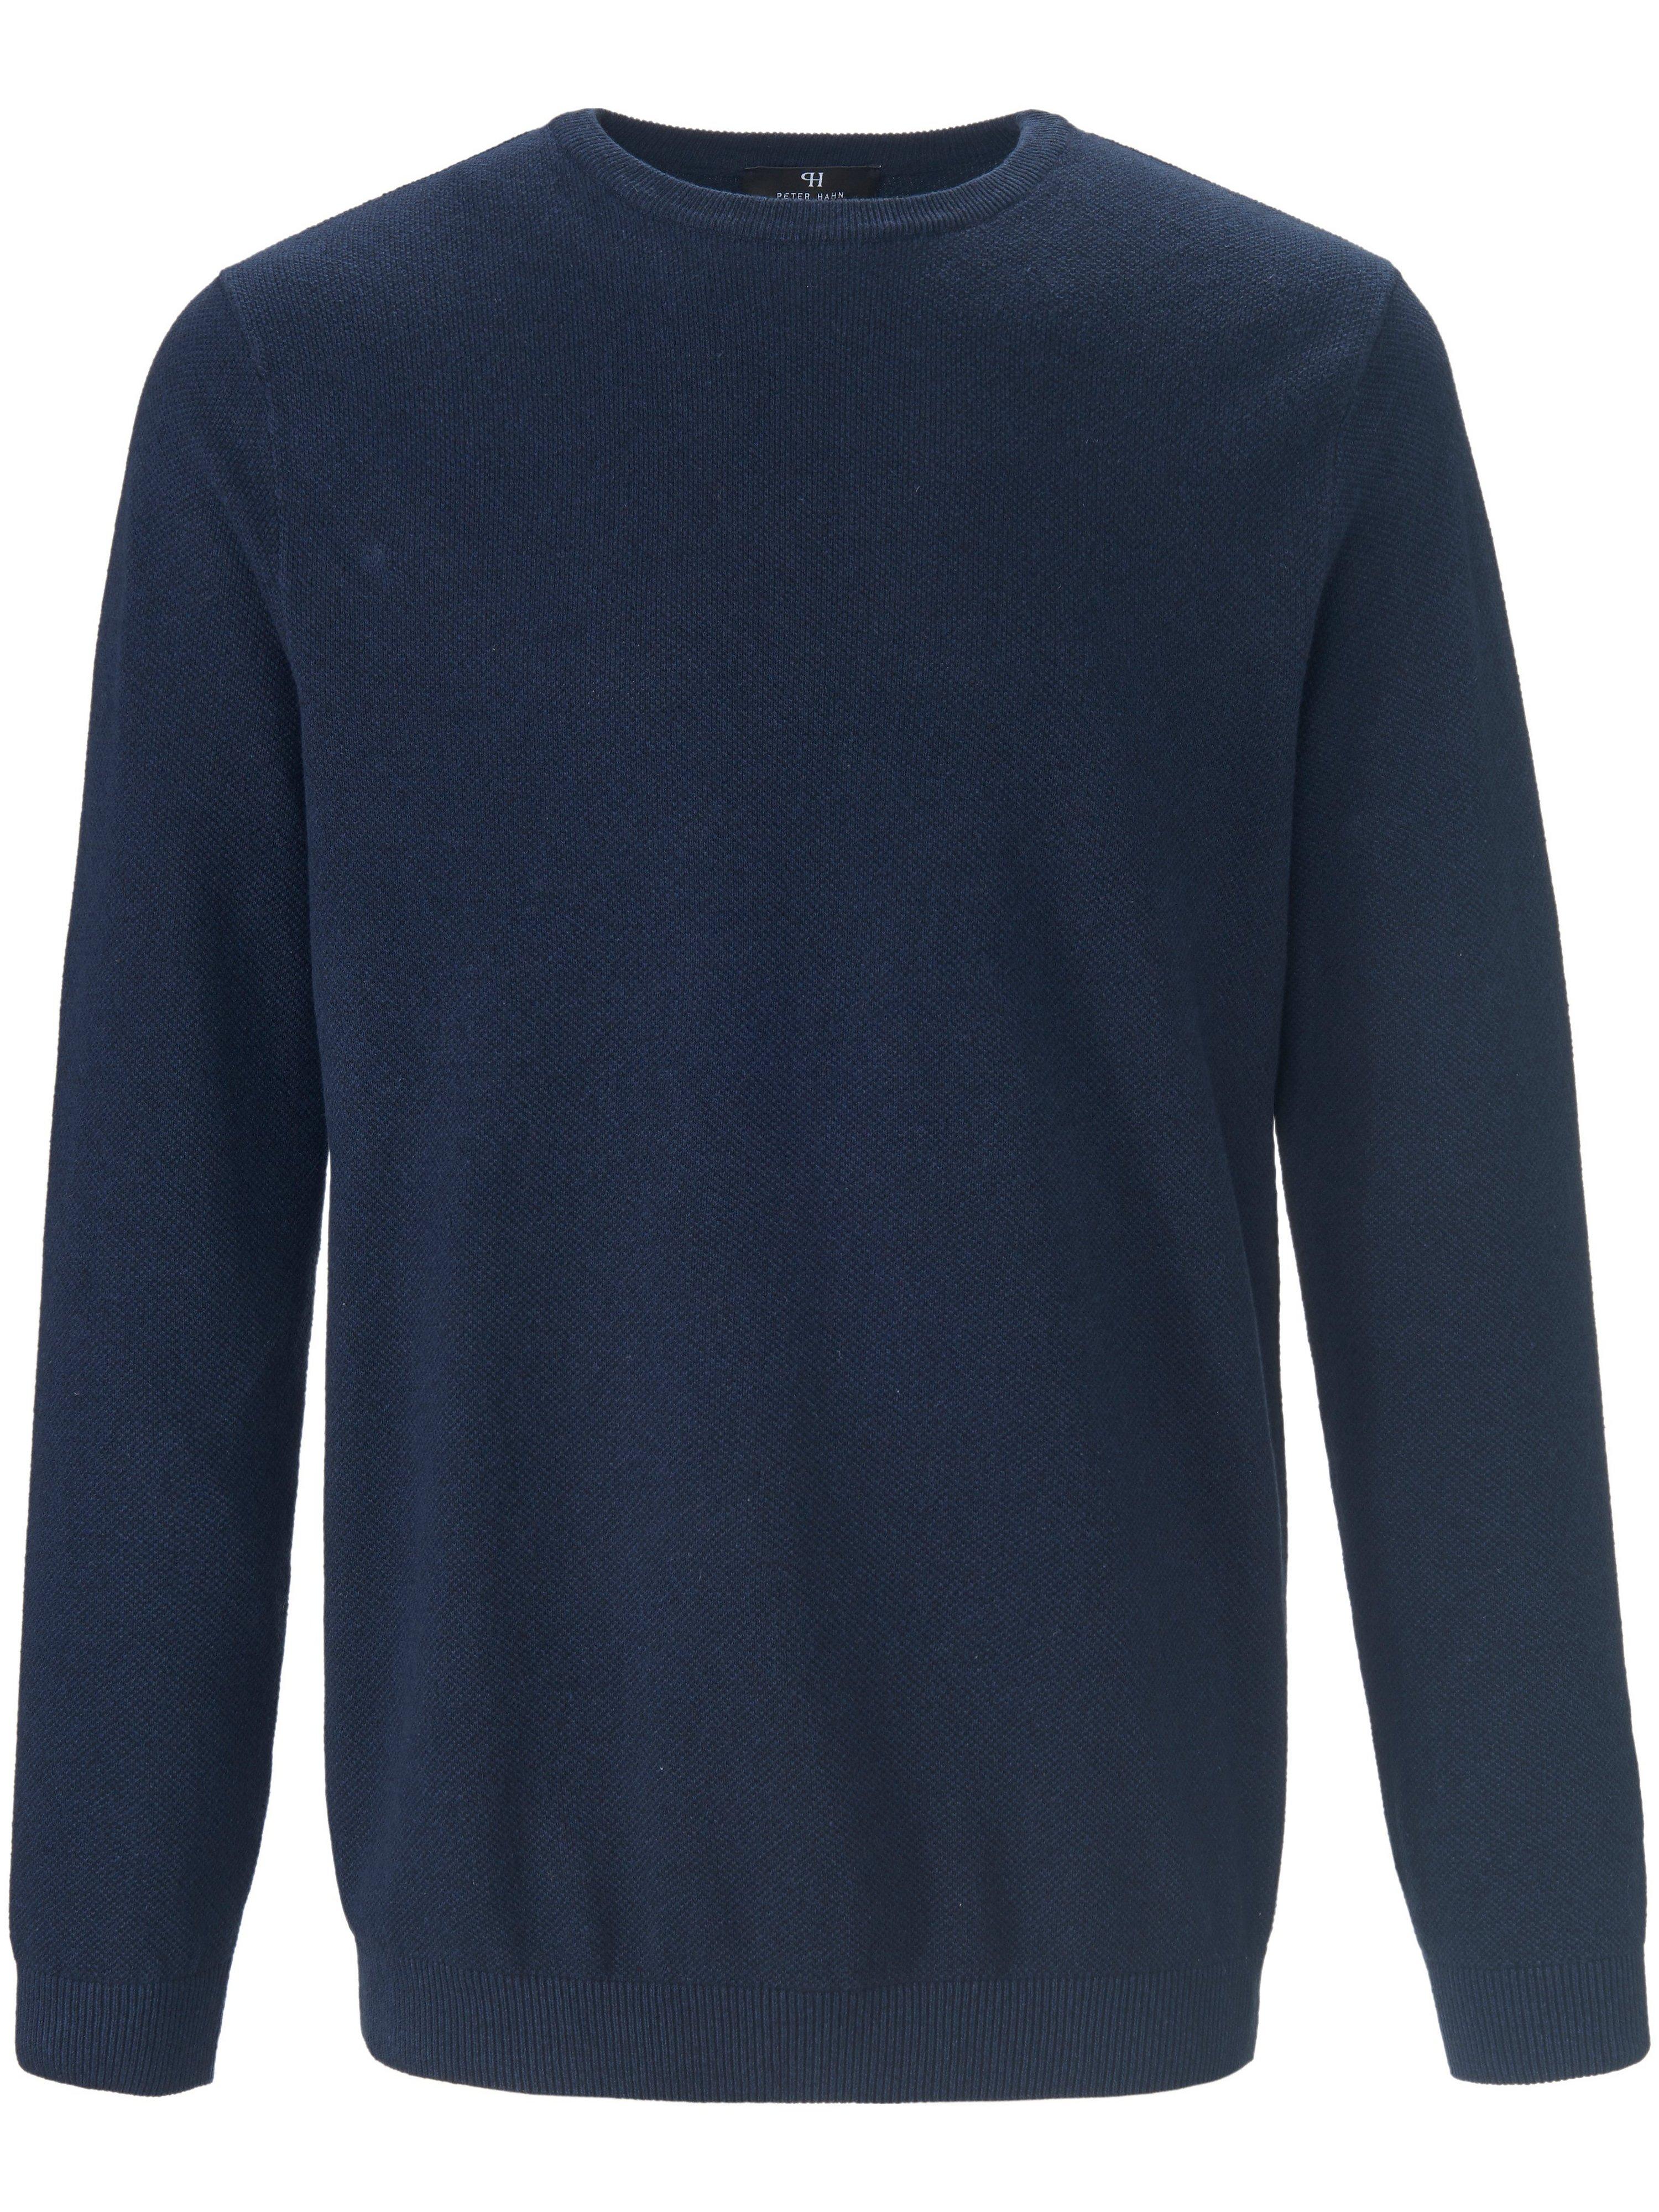 Le pull col ras cou 100% coton  Louis Sayn bleu taille 50